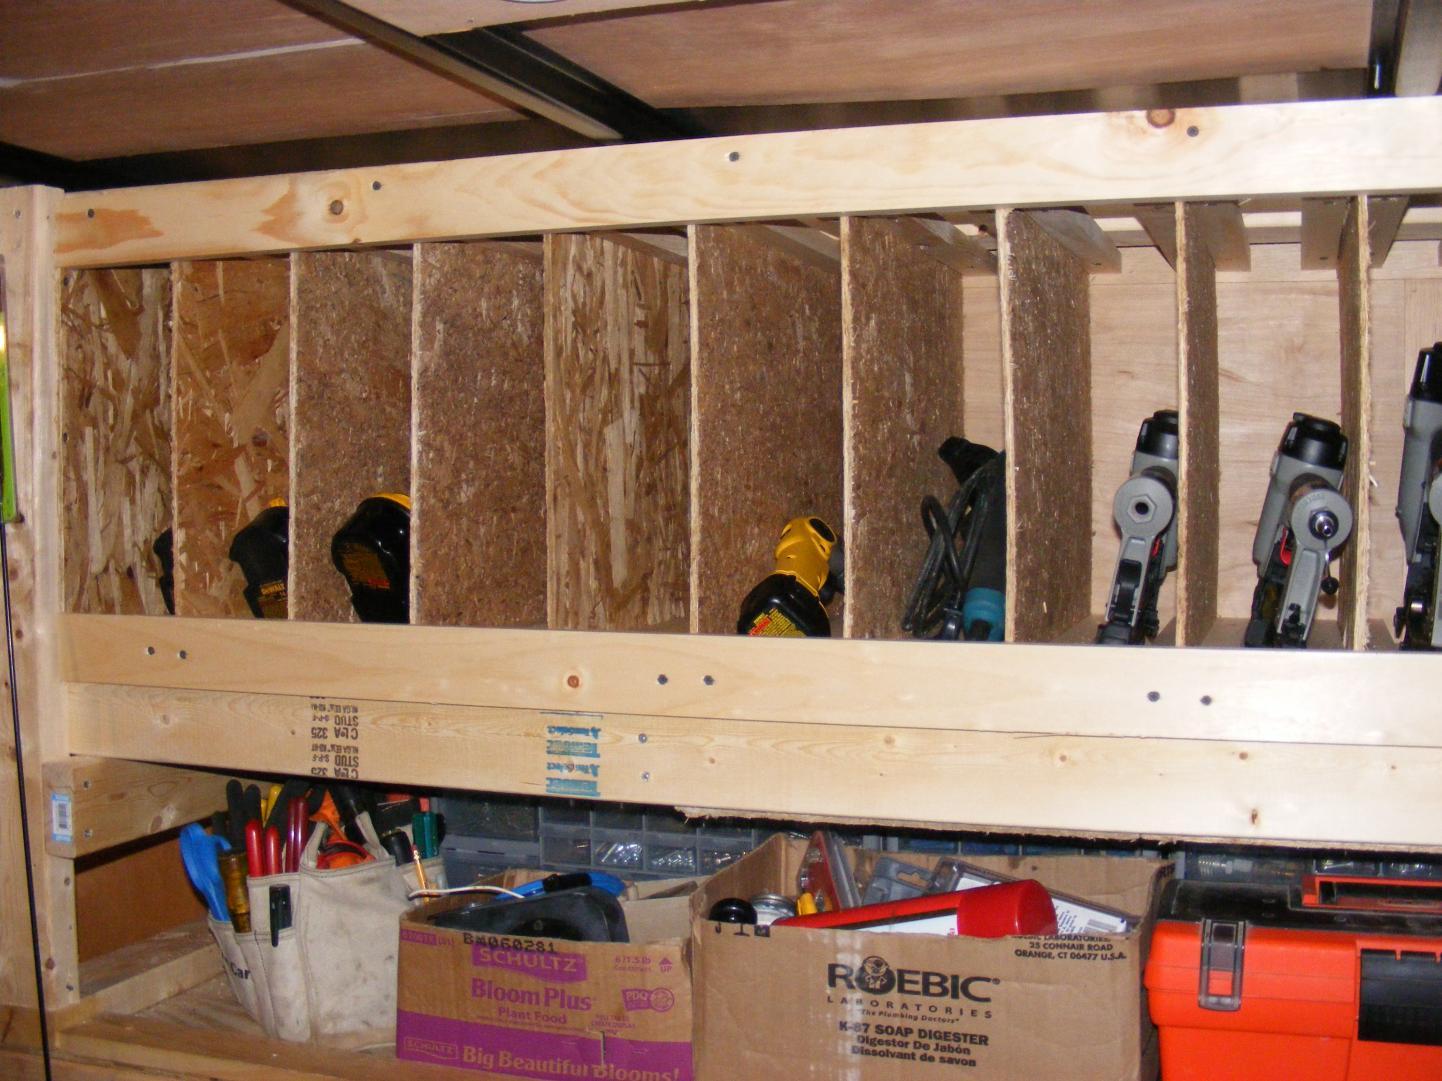 storing cordless tool sets-dscf3195.jpg